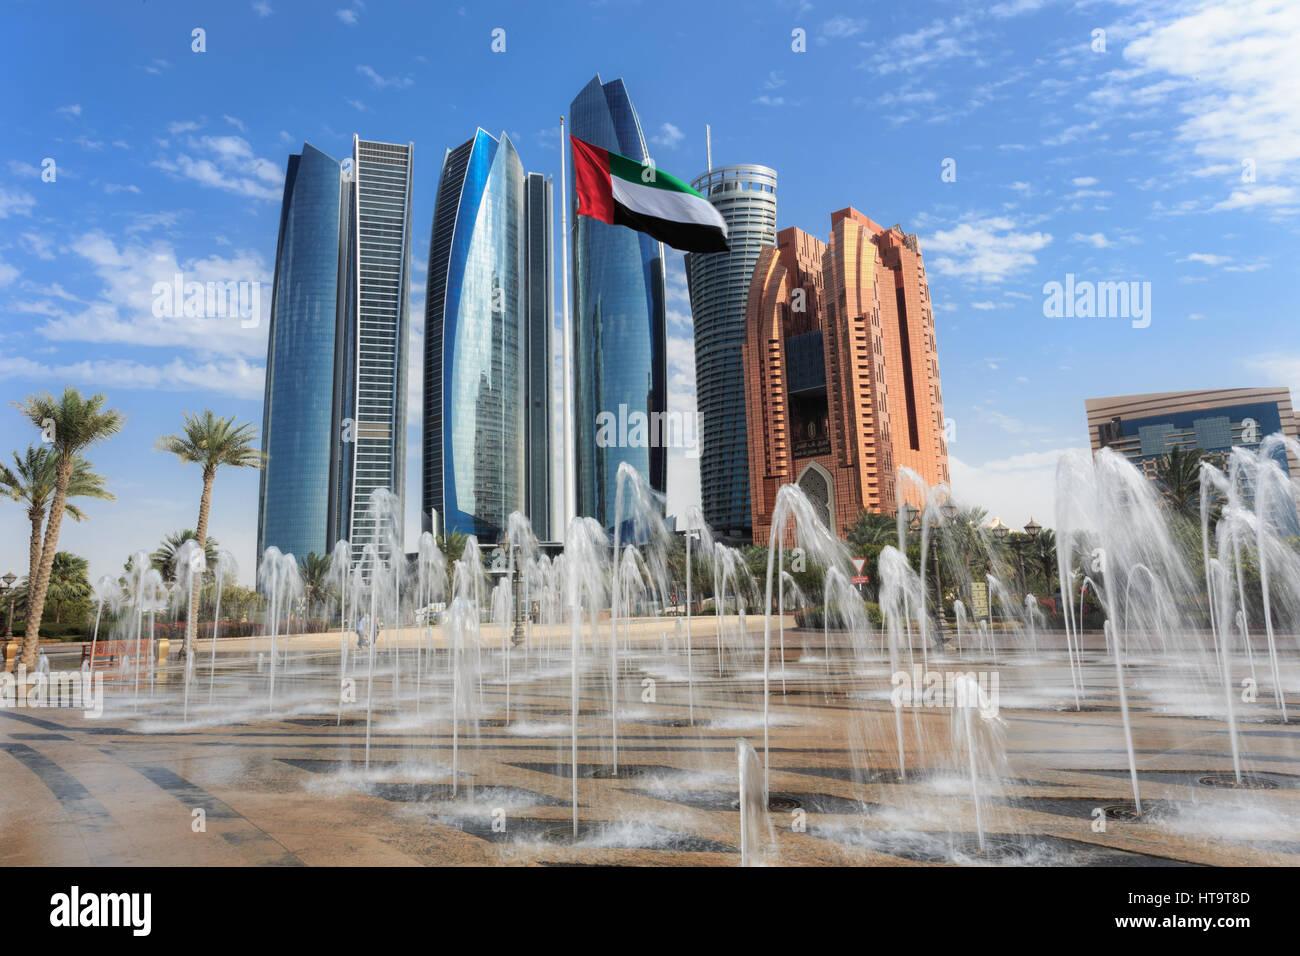 Etihad Towers buildings in Abu Dhabi, United Arab Emirates - Stock Image